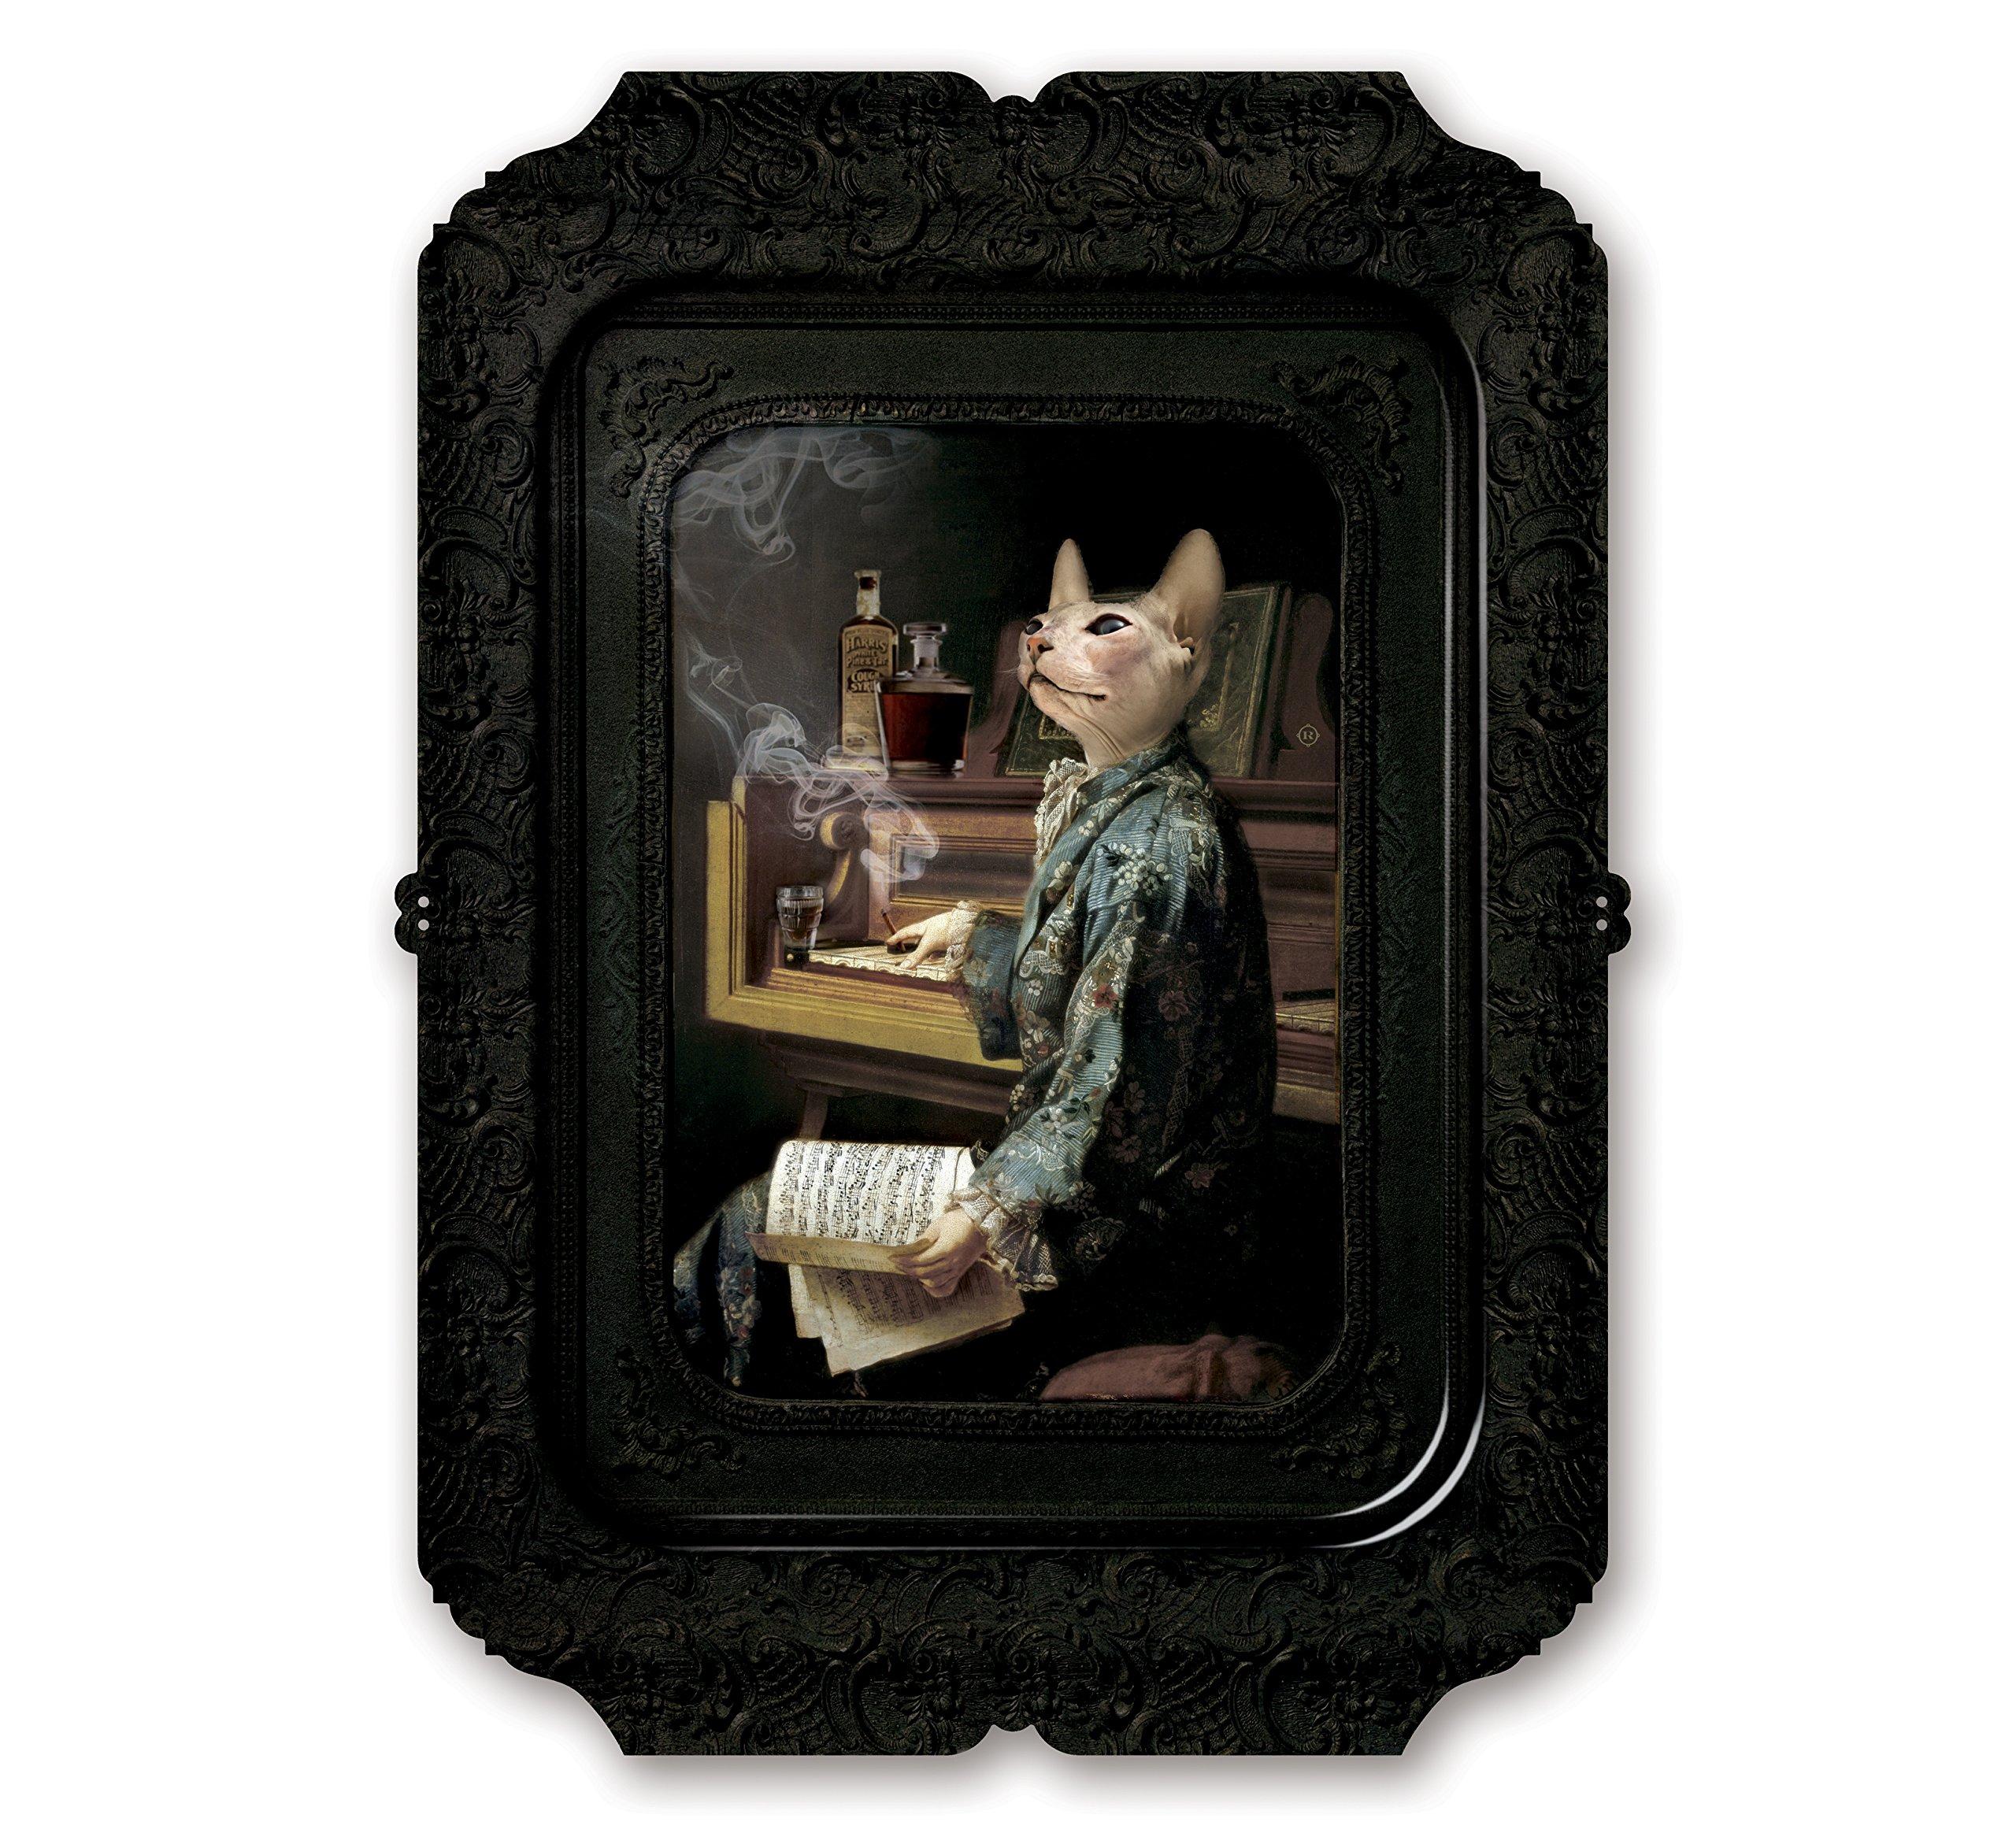 Lazy Victoire - Galerie De Portraits - Visconti - Surreal Wall Tray Art Masterwork by iBride